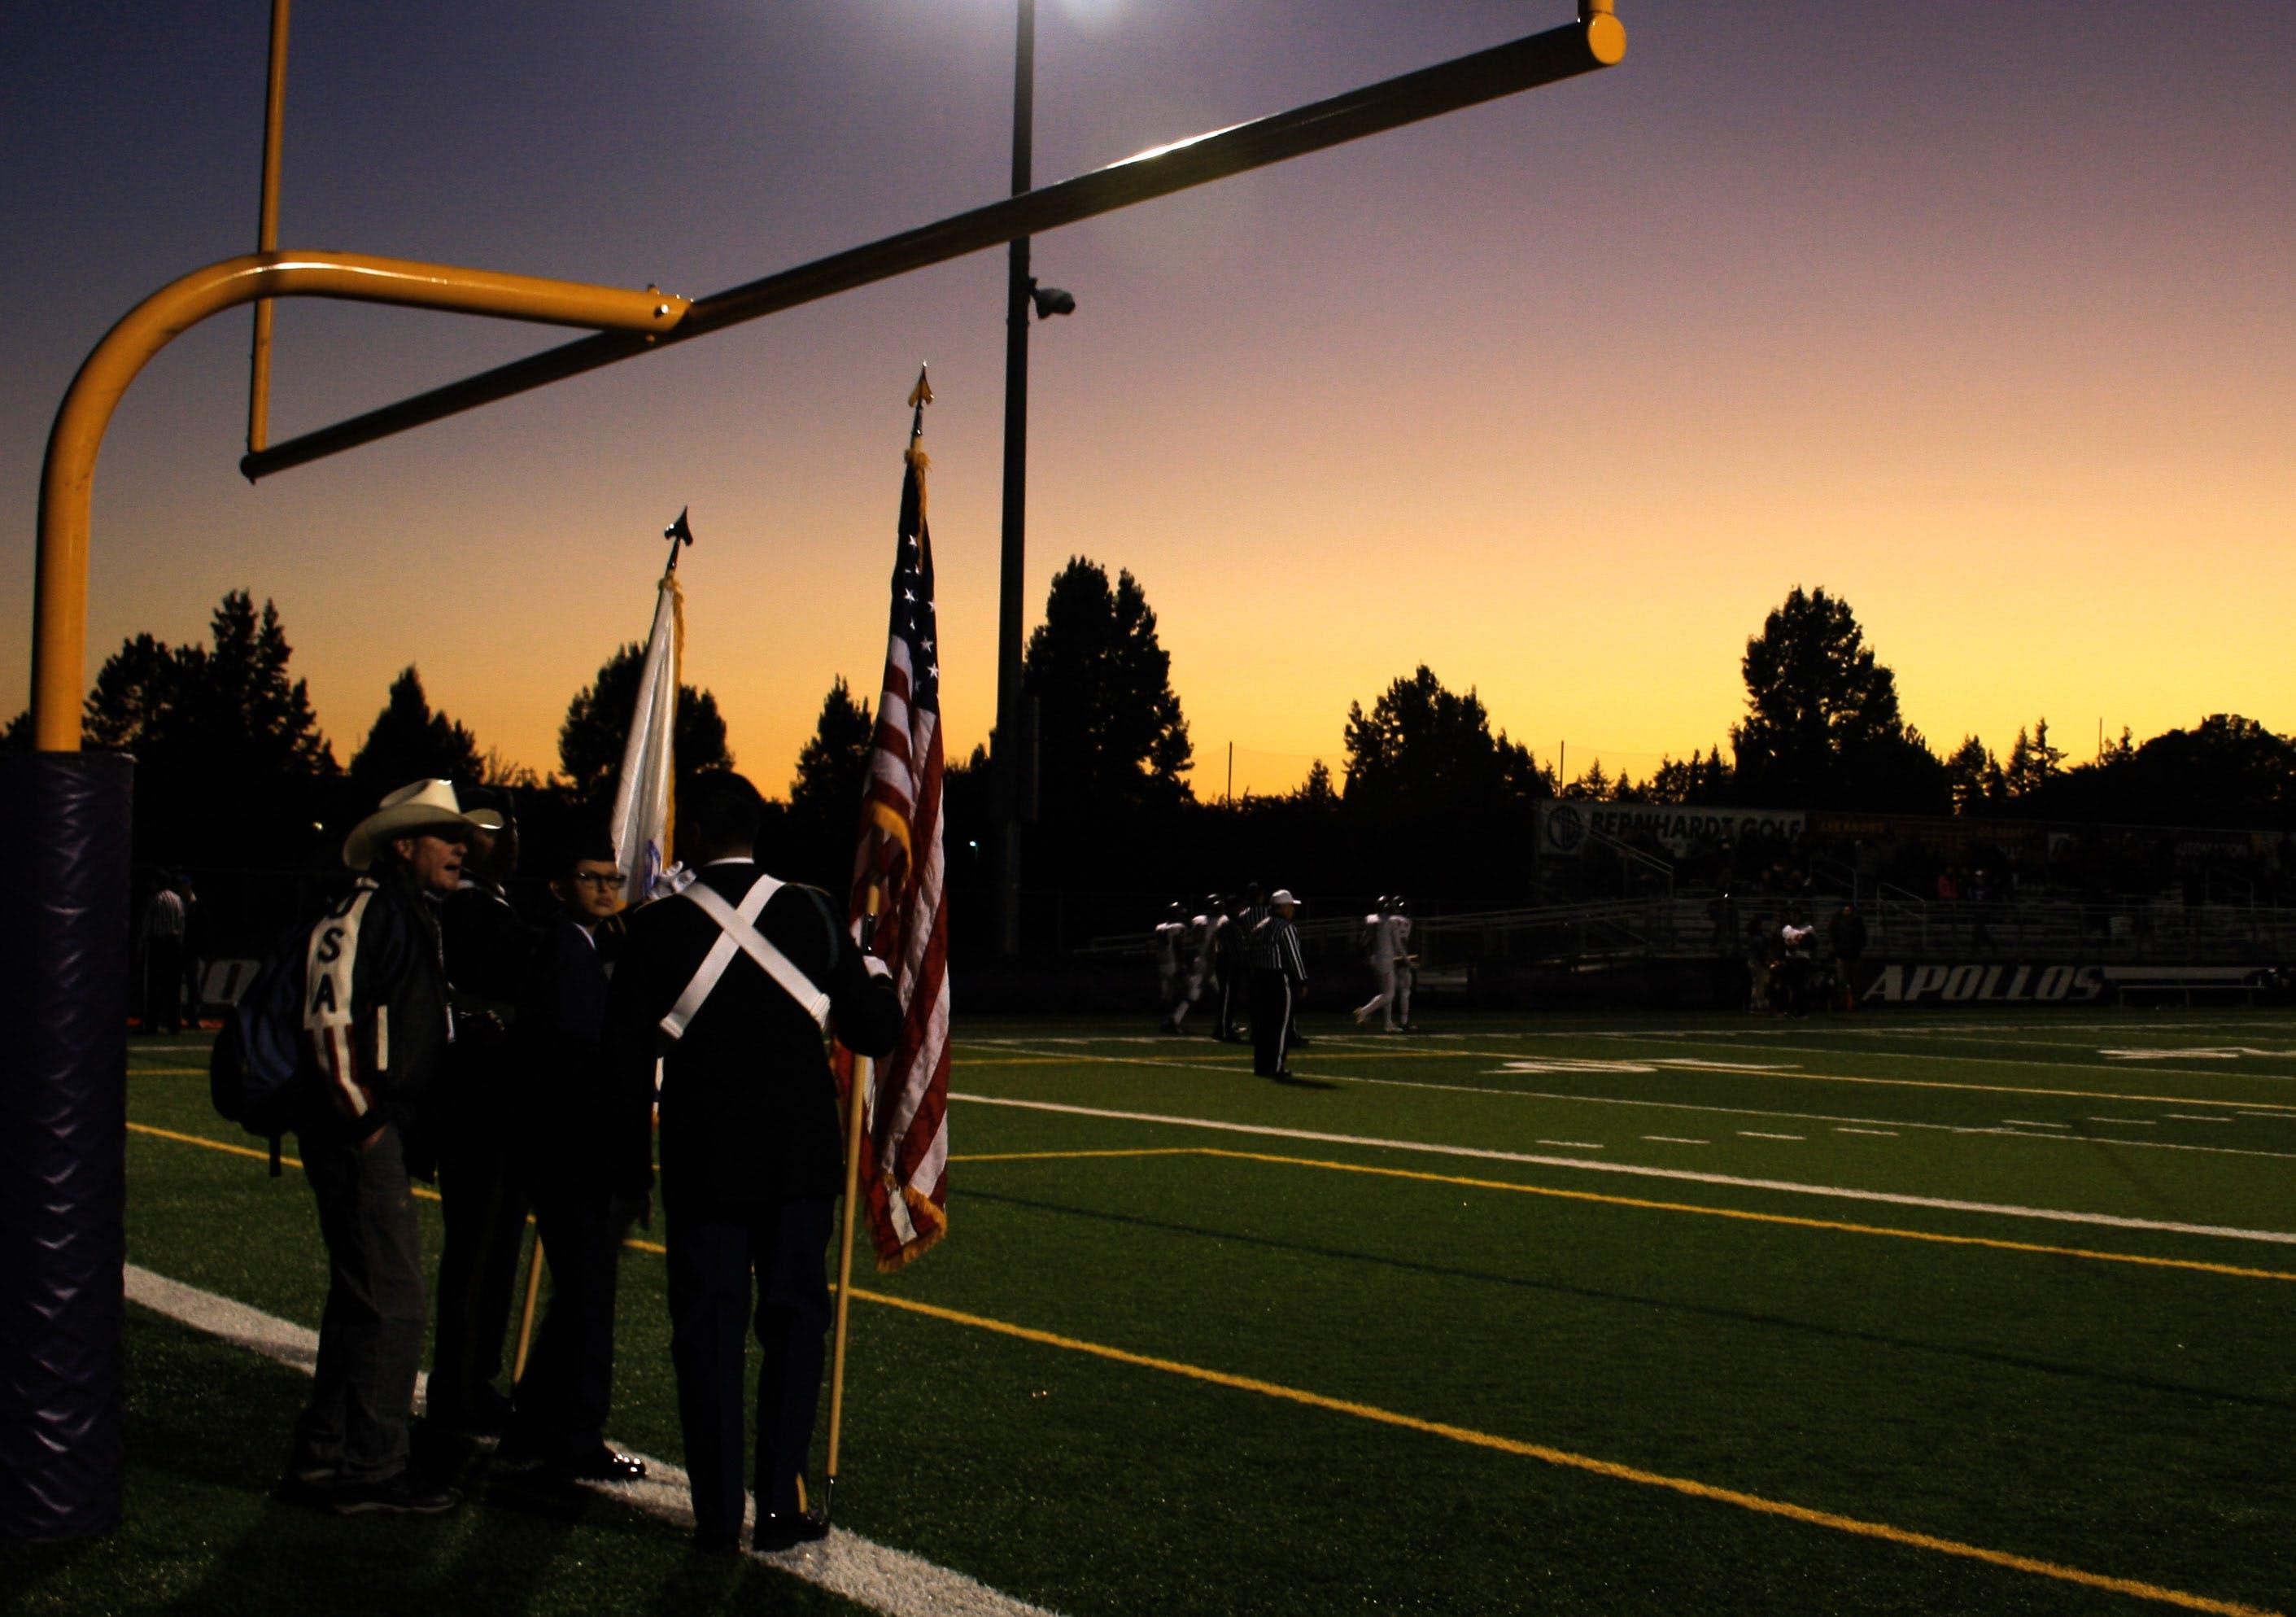 Kostenloses Stock Foto zu amerika, amerikanische flagge, athleten, bäume